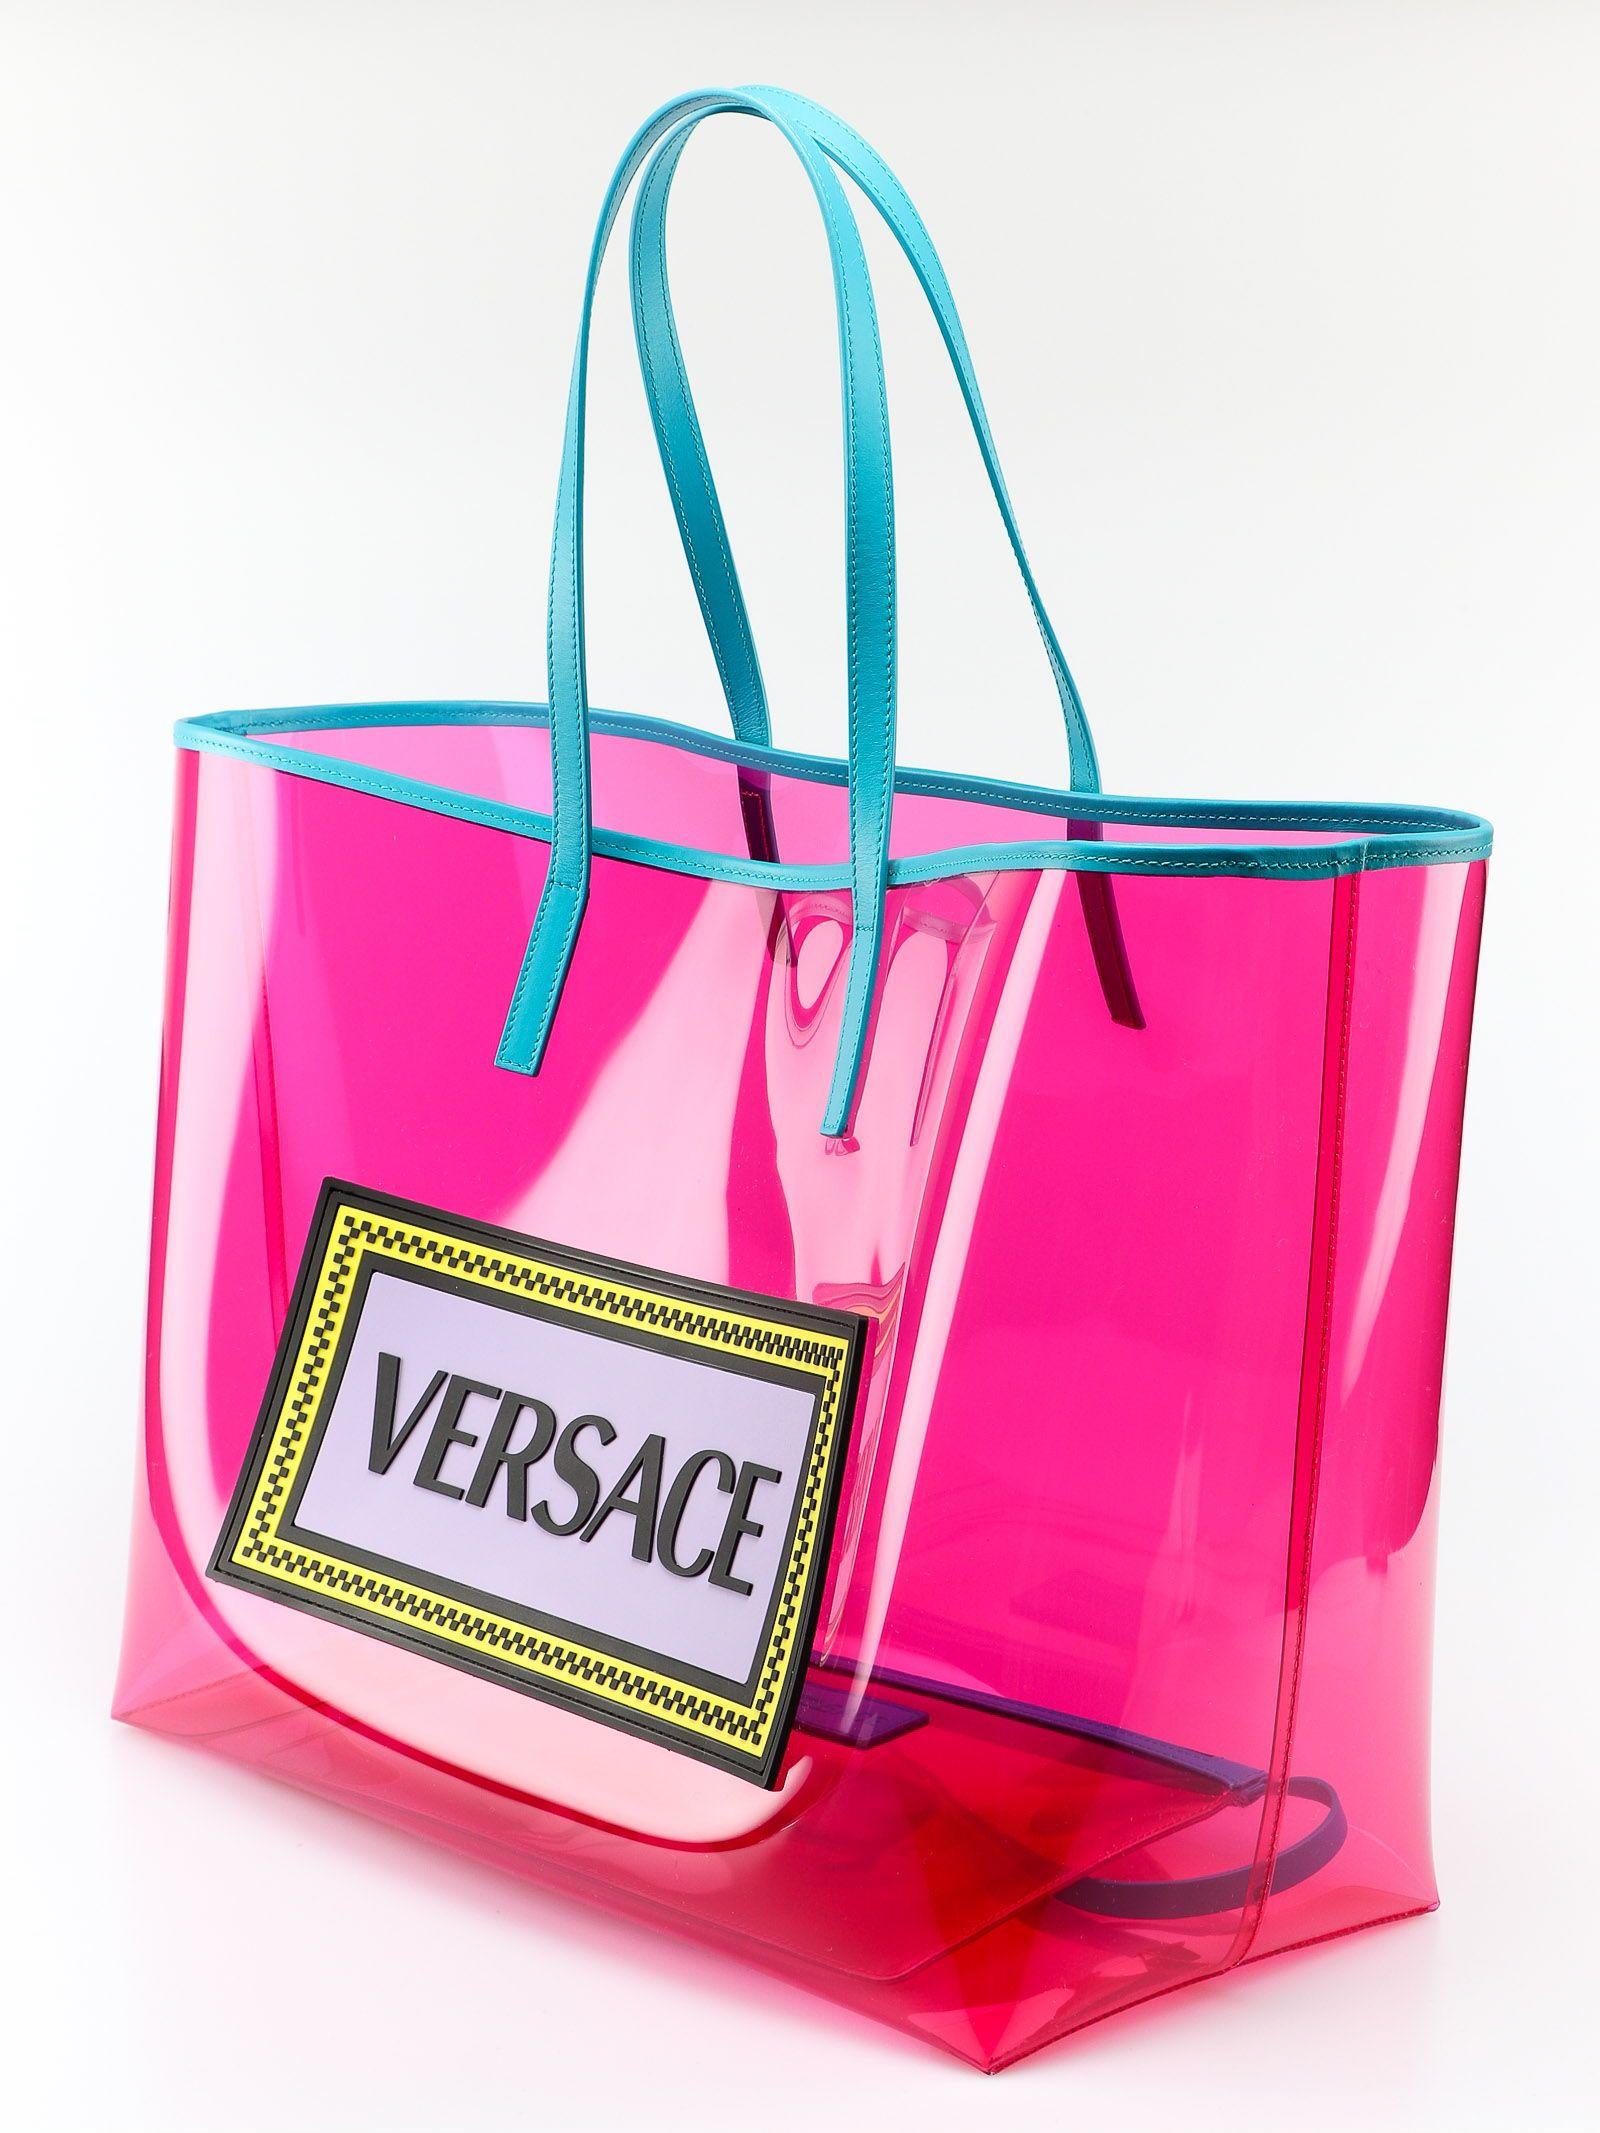 ba92b6e42f76 Versace Versace Clear Vinyl Tote - Mt Rosa Fluo Multicolor ...